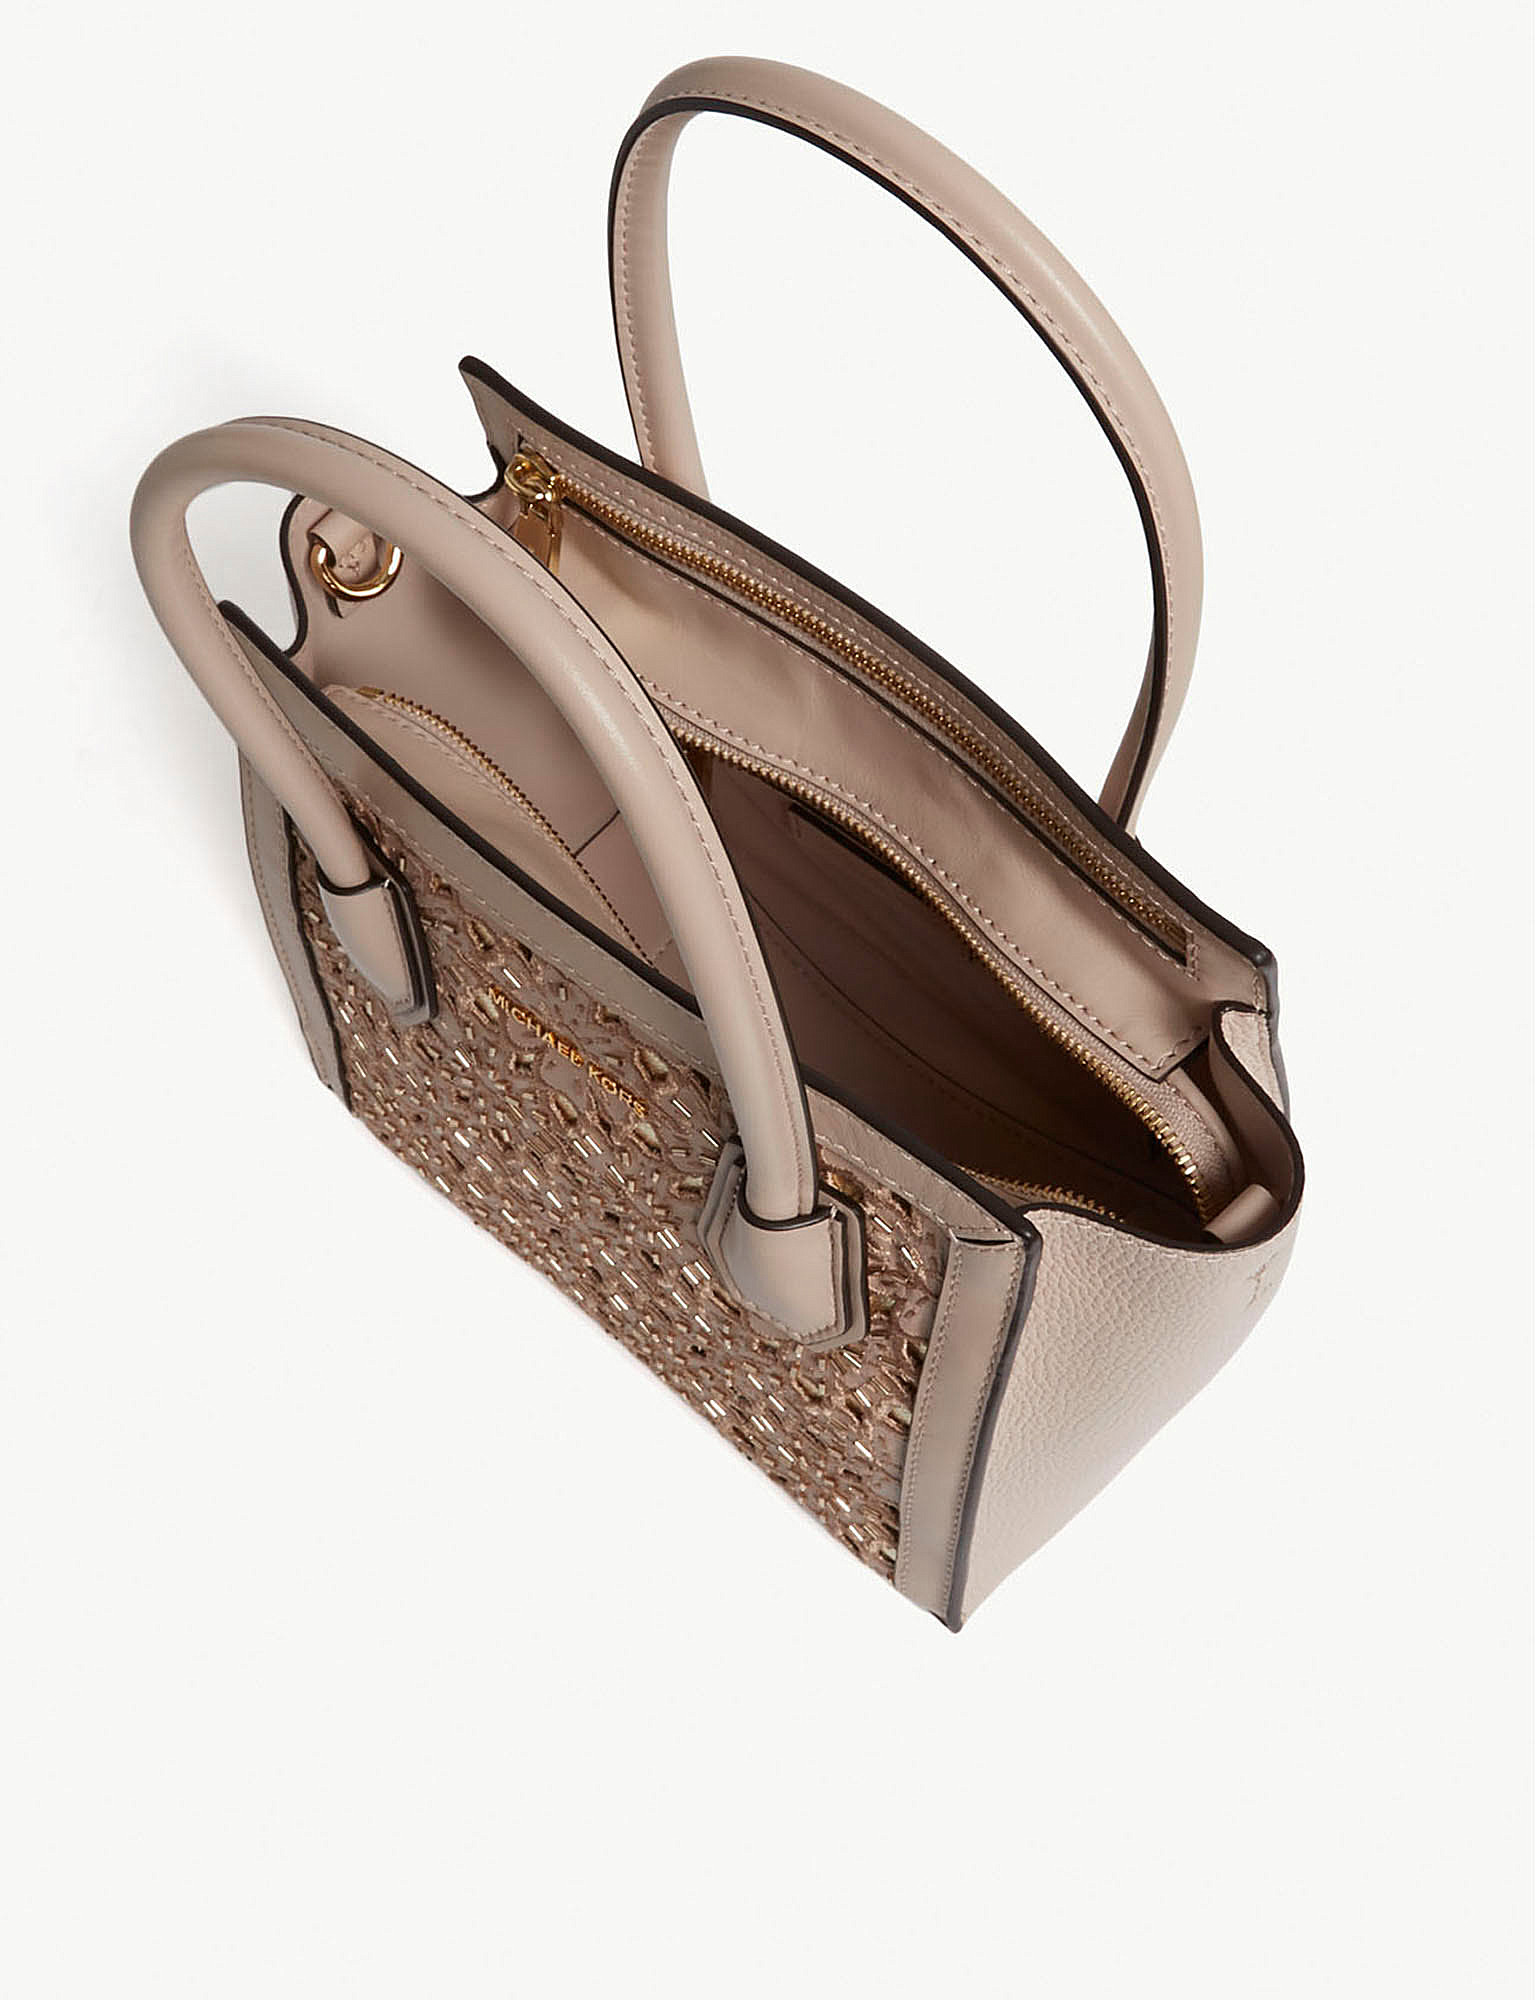 b994f57ccd8d MICHAEL MICHAEL KORS - Mercer medium floral leather messenger bag ...